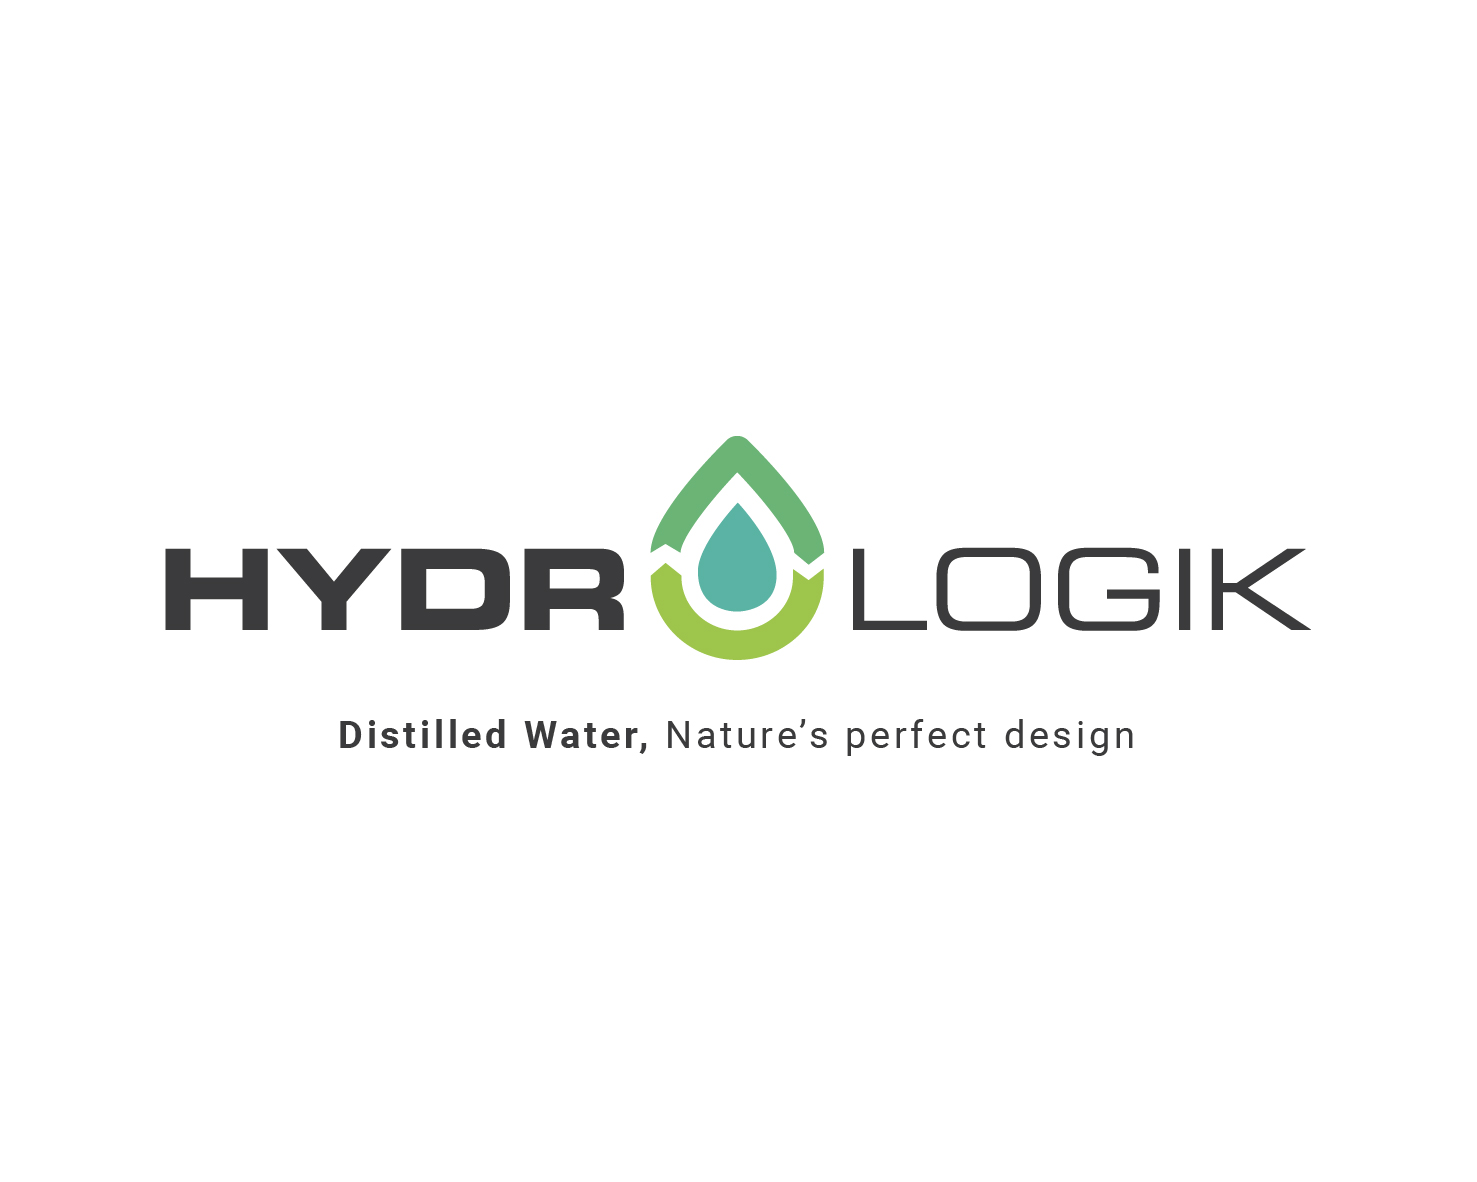 Hydrologik